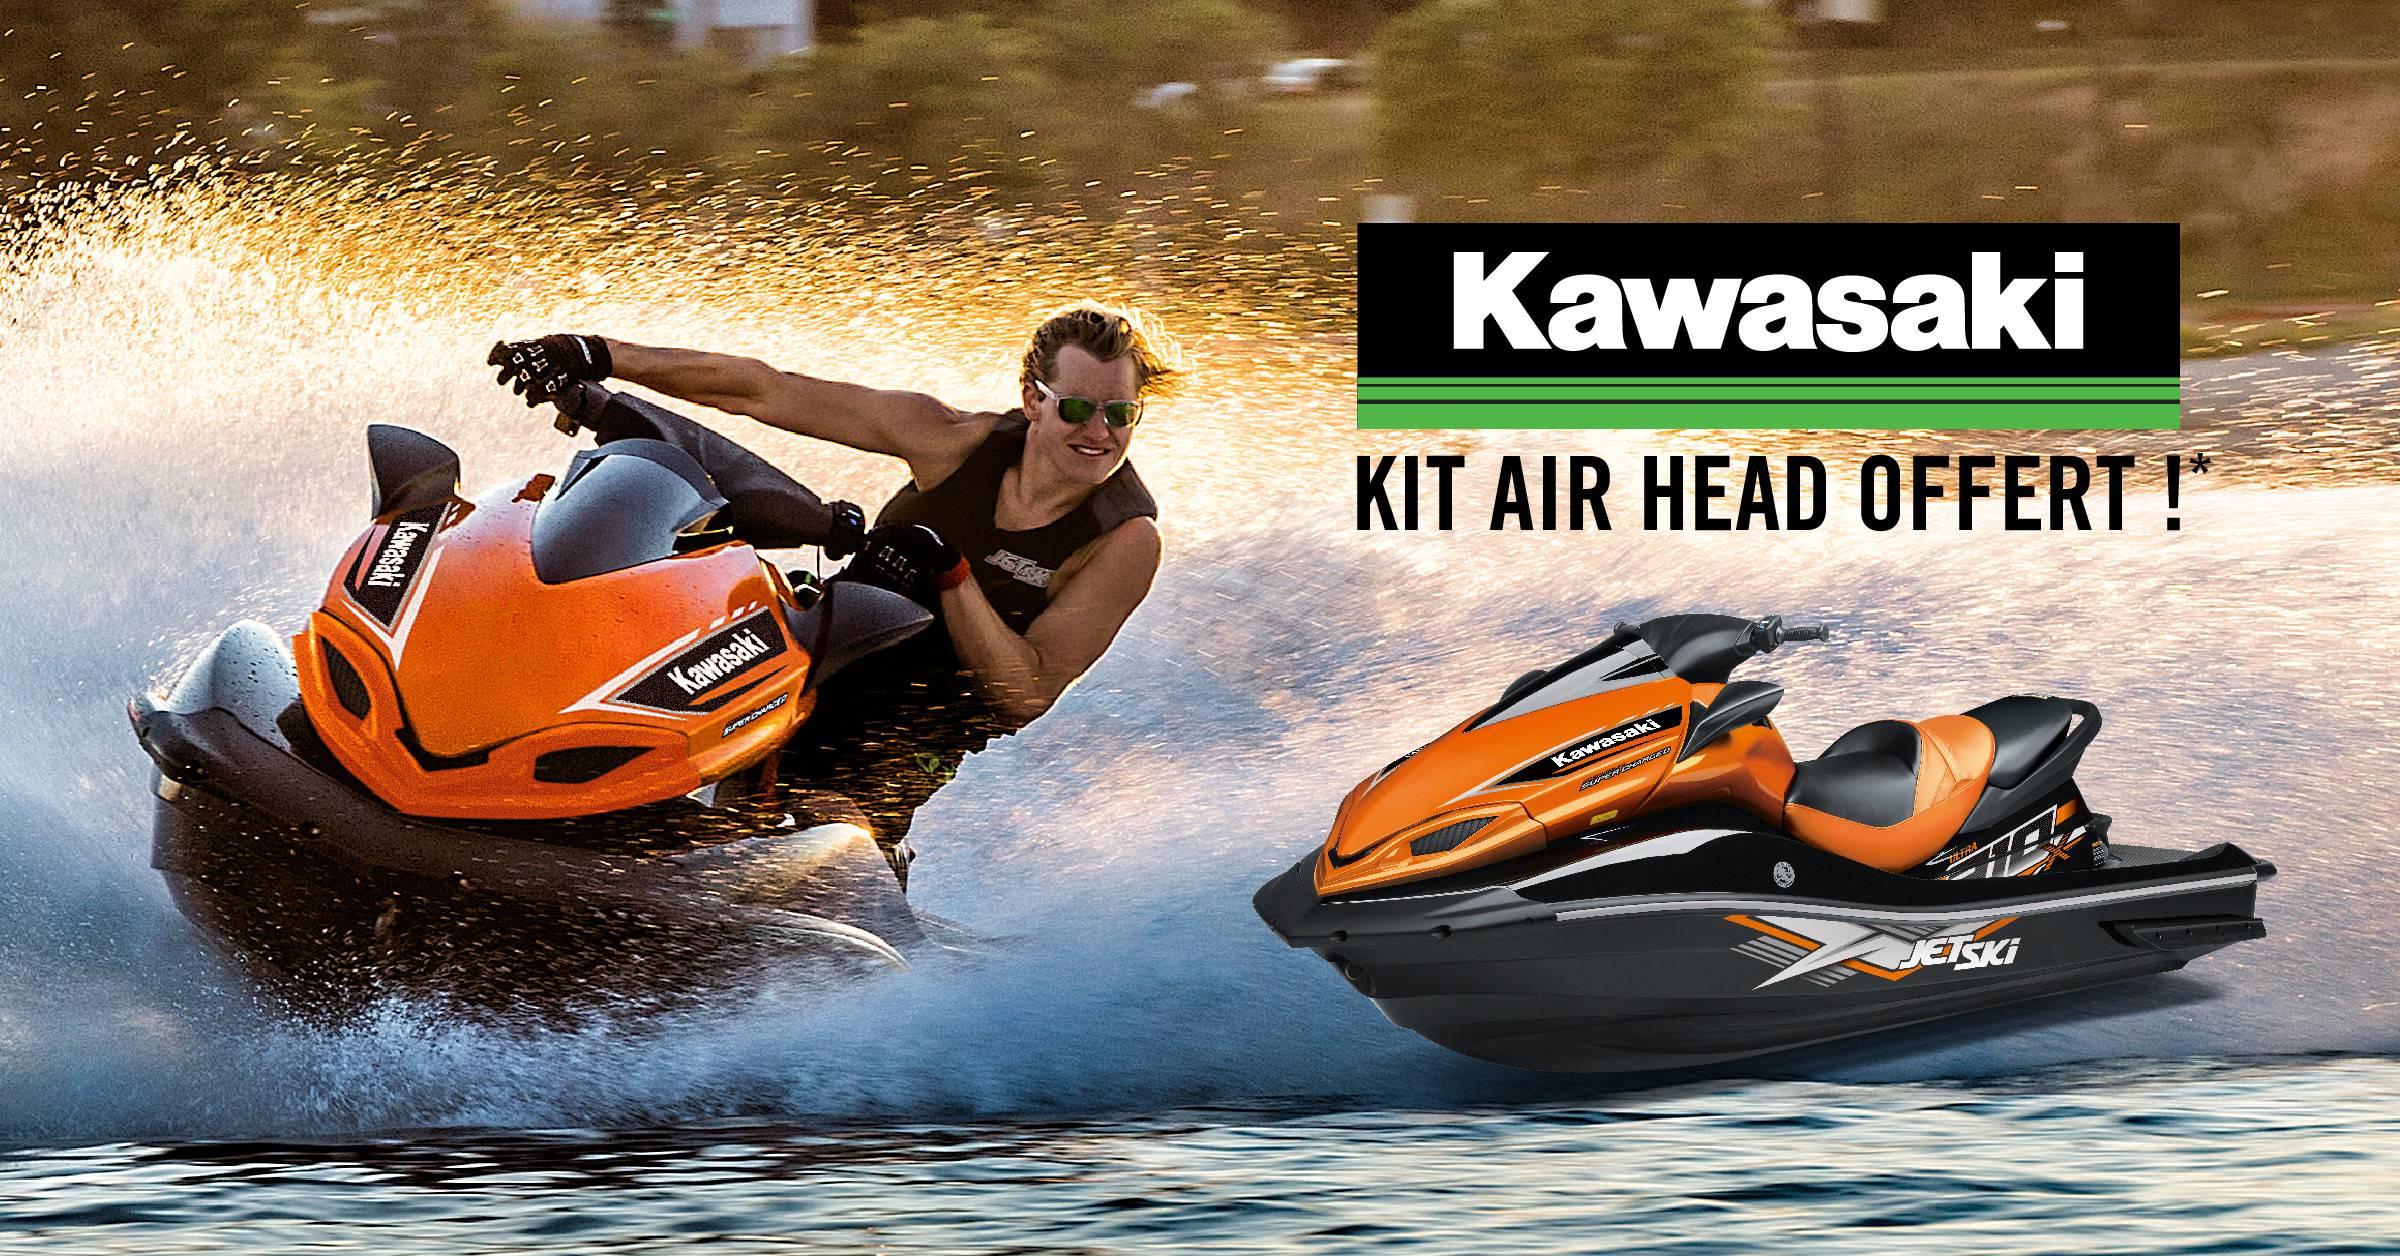 Kit Air Head et corde offerts pour tout achat d'un Jet Ski Kawasaki !